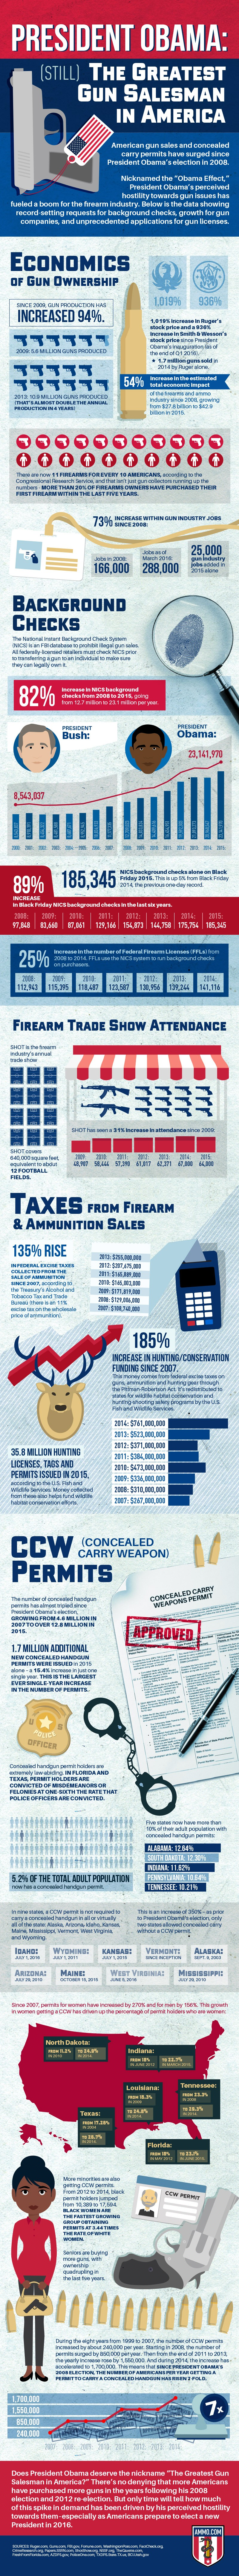 President Obama: (Still) The Greatest Gun Salesman in America [INFOGRAPHIC]